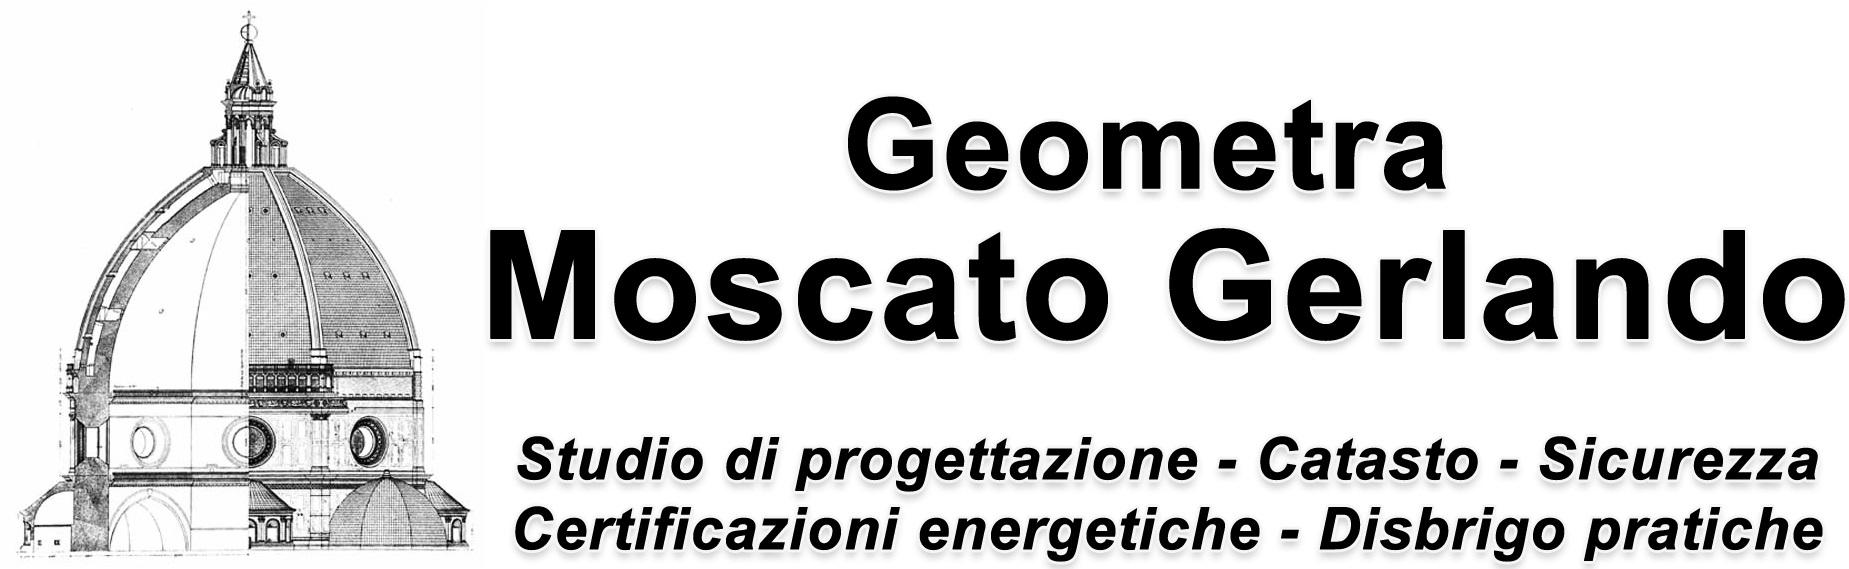 Geometra Moscato Gerlando